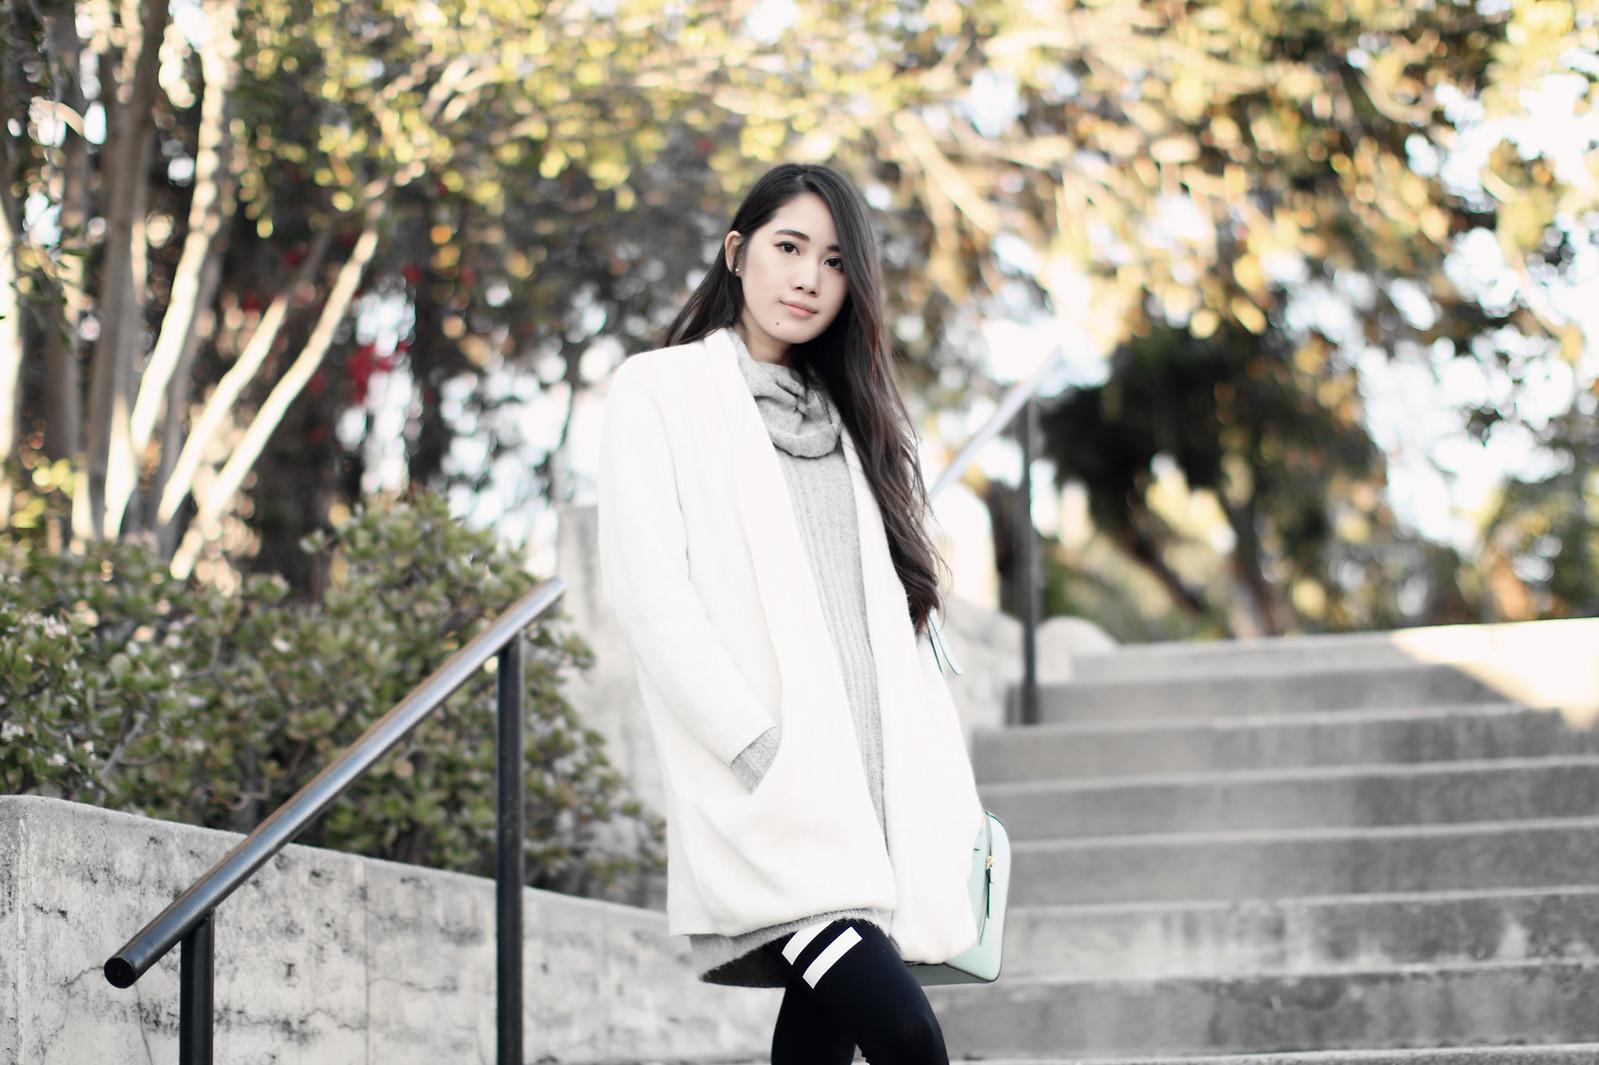 1529-ootd-fashion-style-tobi-cowl-neck-turtleneck-sweater-dress-asianfashion-koreanfashion-winterfashion-clothestoyouuu-elizabeeetht